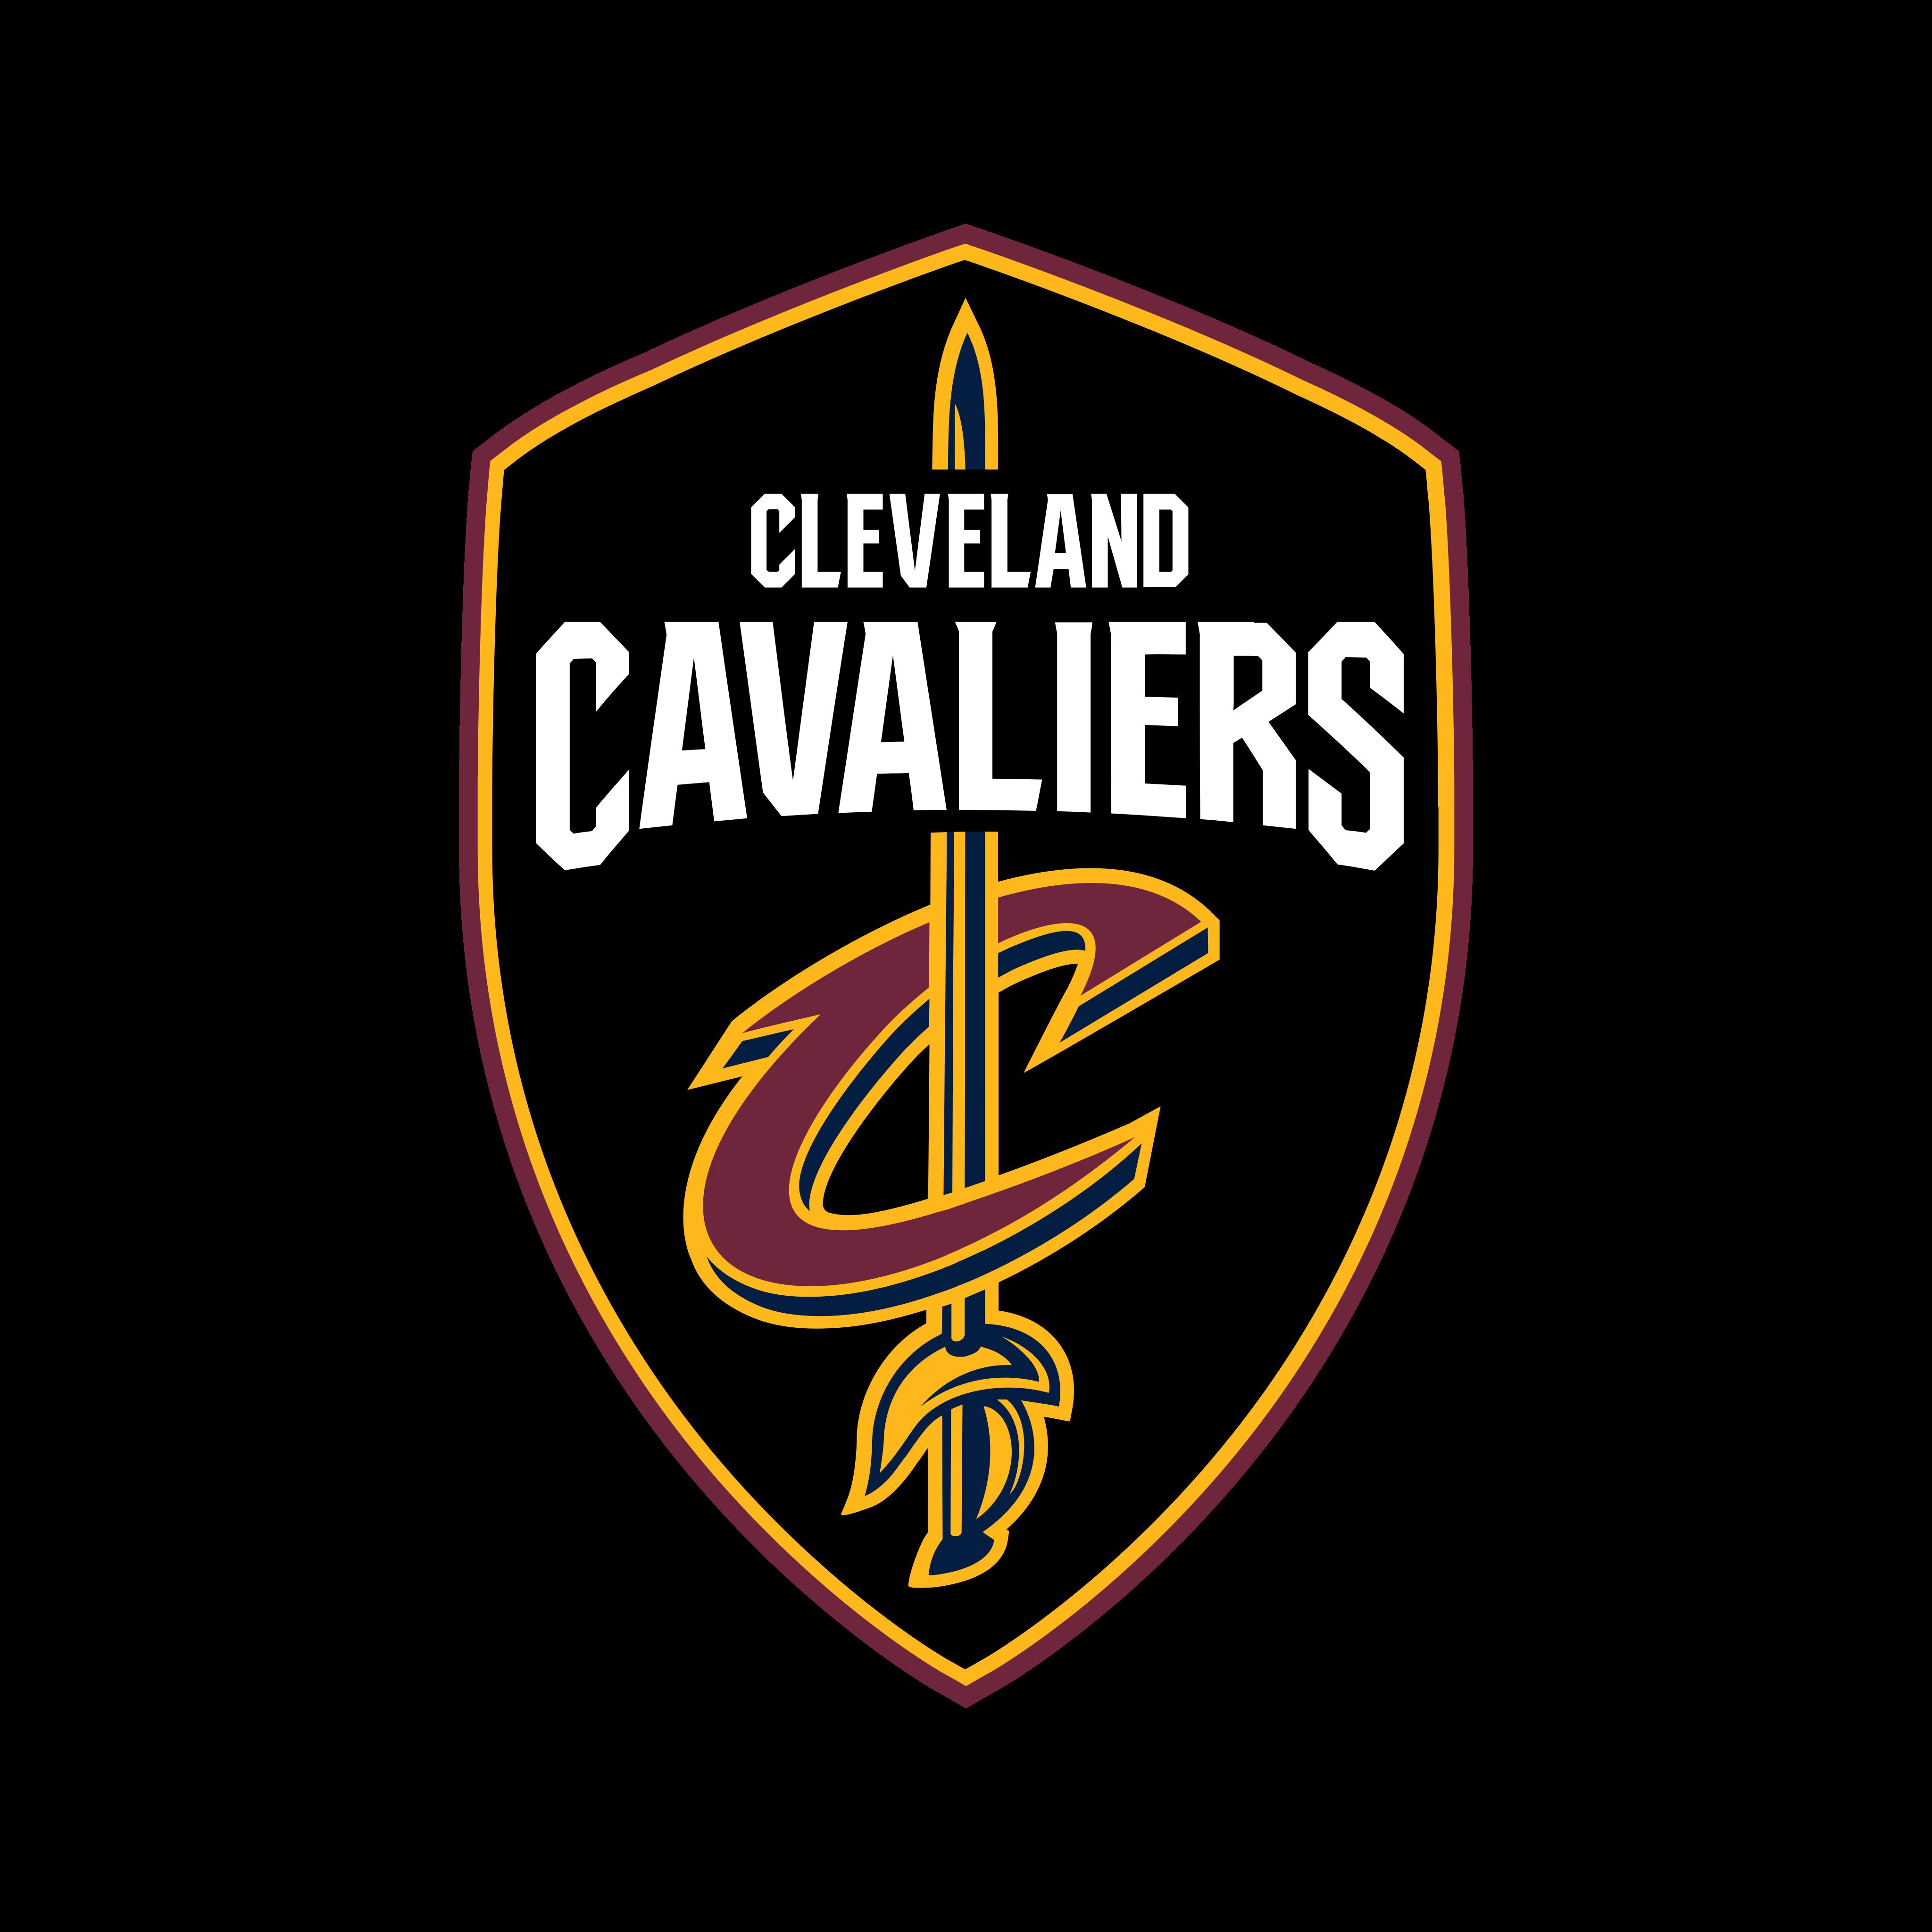 cleveland cavaliers logo 0 - Cleveland Cavaliers Logo